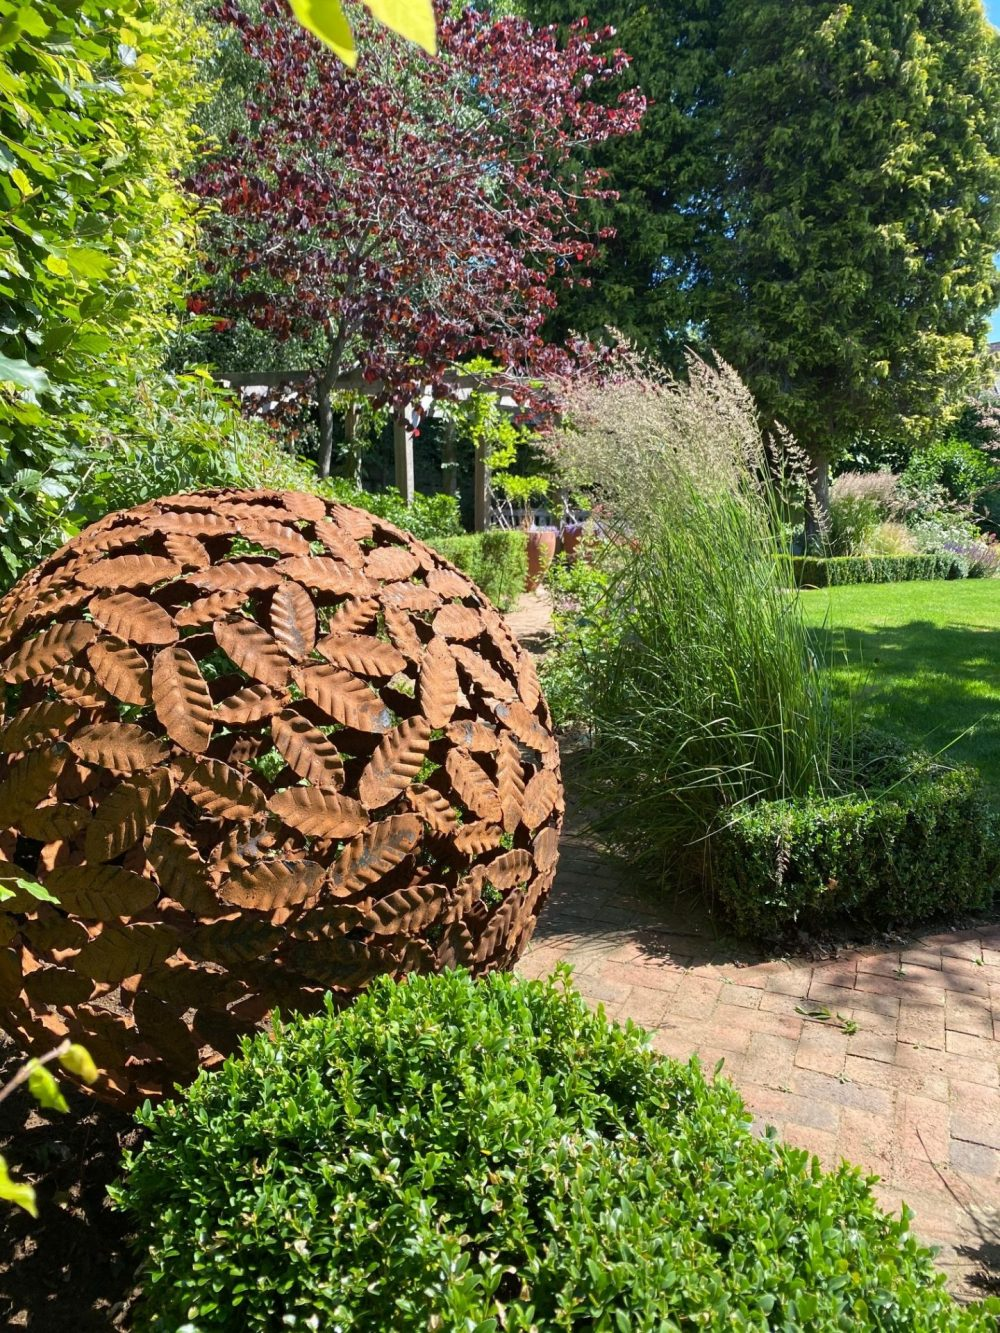 Beech Leaf Sphere Sculpture in Woodland